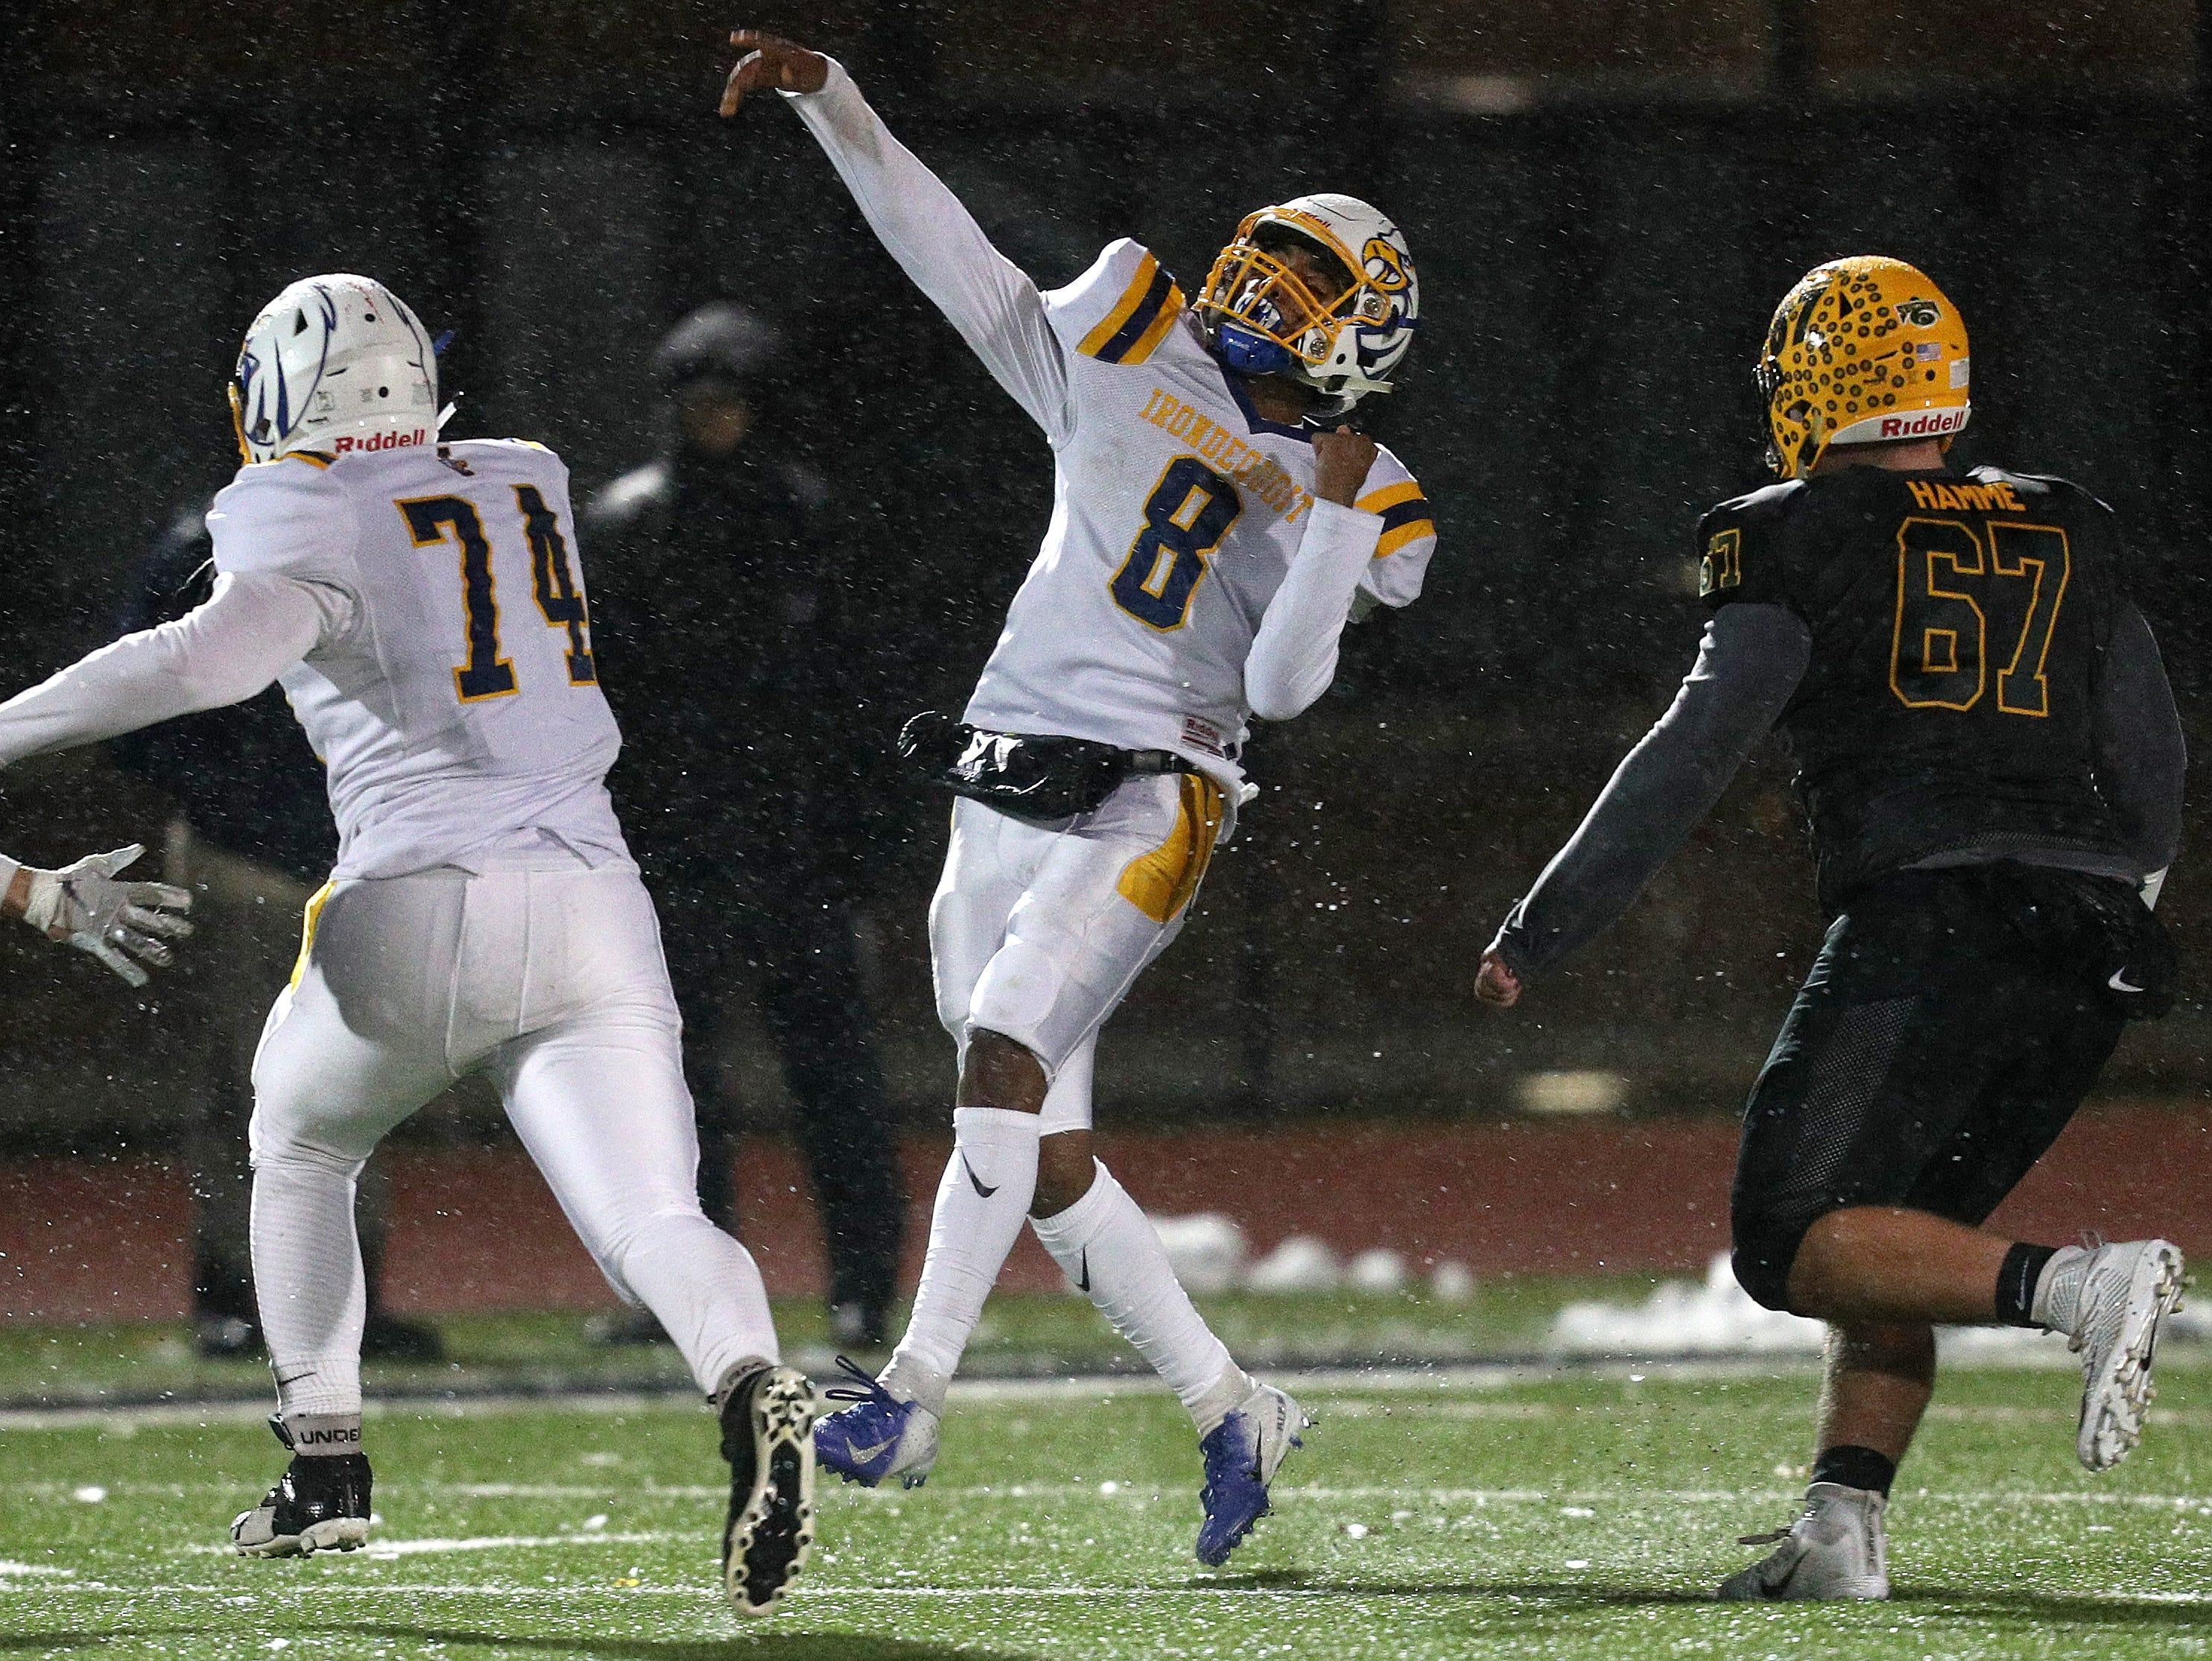 Irondequoit quarterback Freddy June Jr. throws deep against West Seneca East.